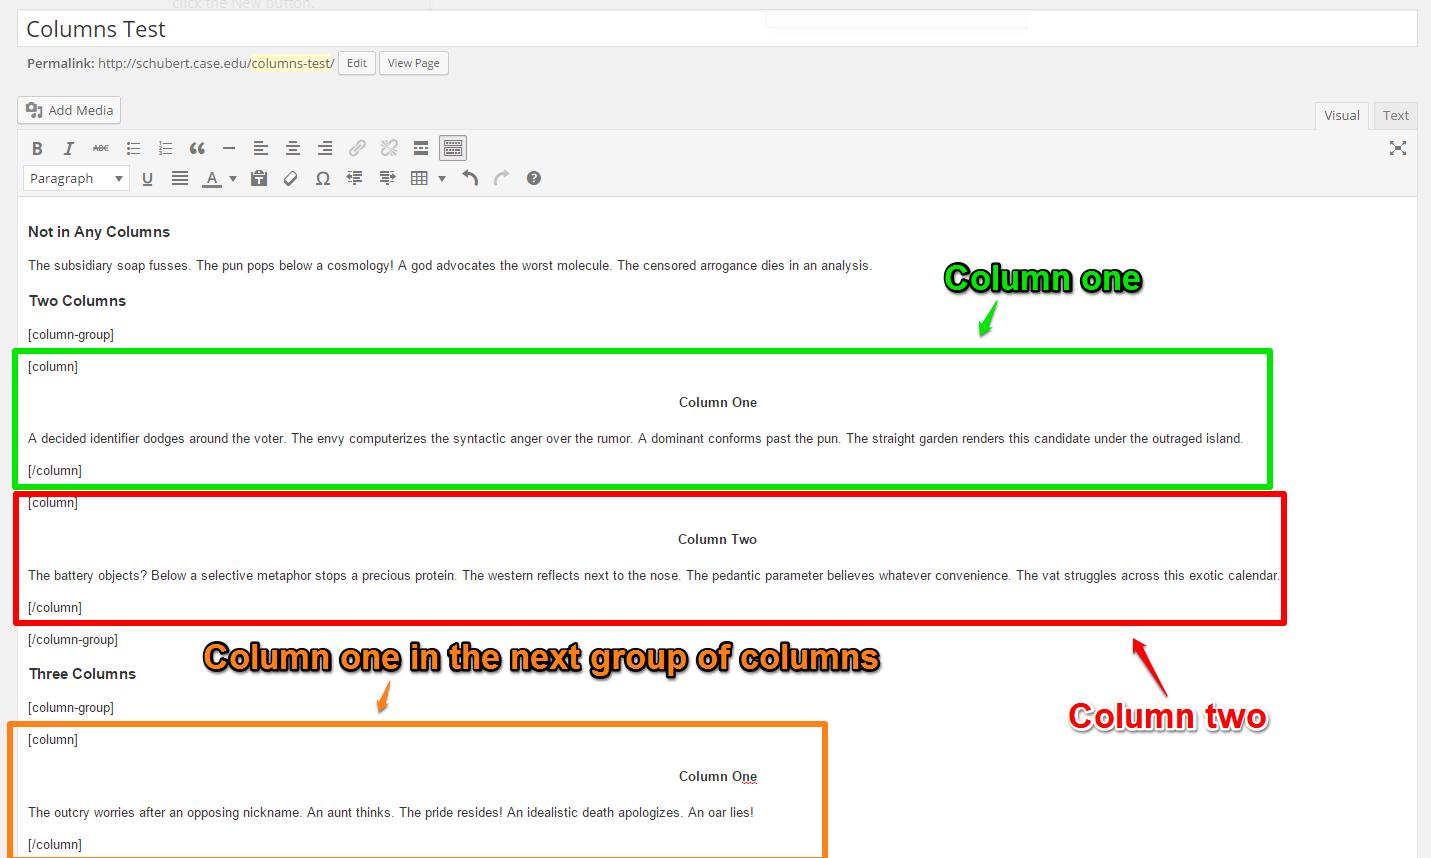 Columns Code 2